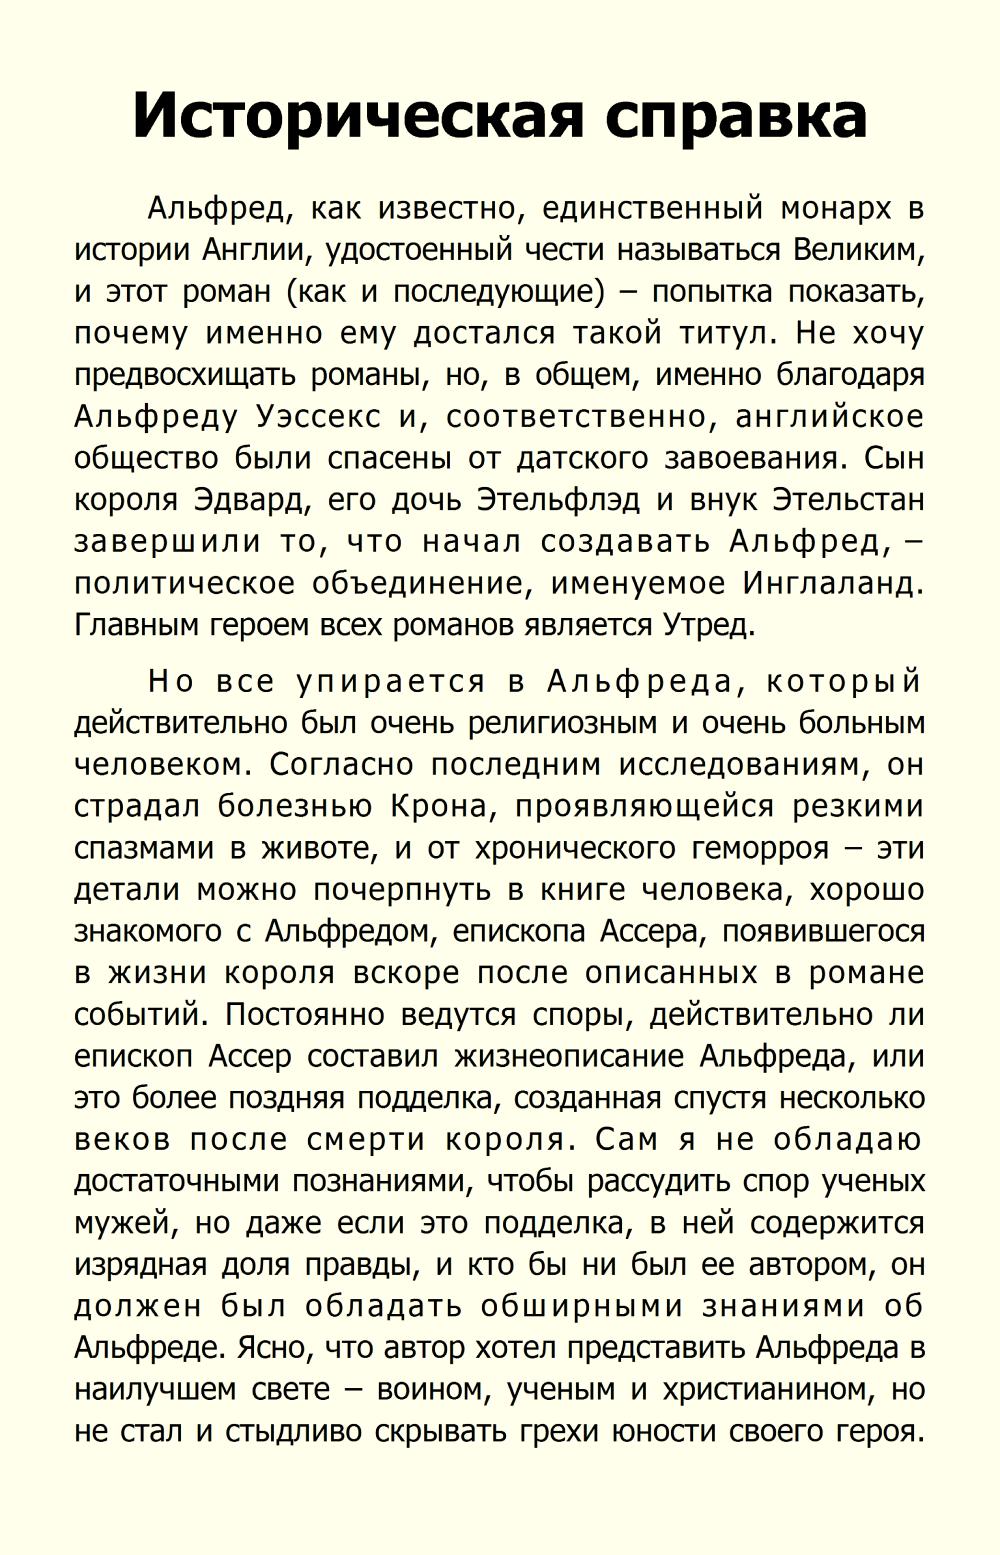 http://i4.imageban.ru/out/2013/11/12/c77cf25bbe3902206408a05d3b36c1d2.jpg